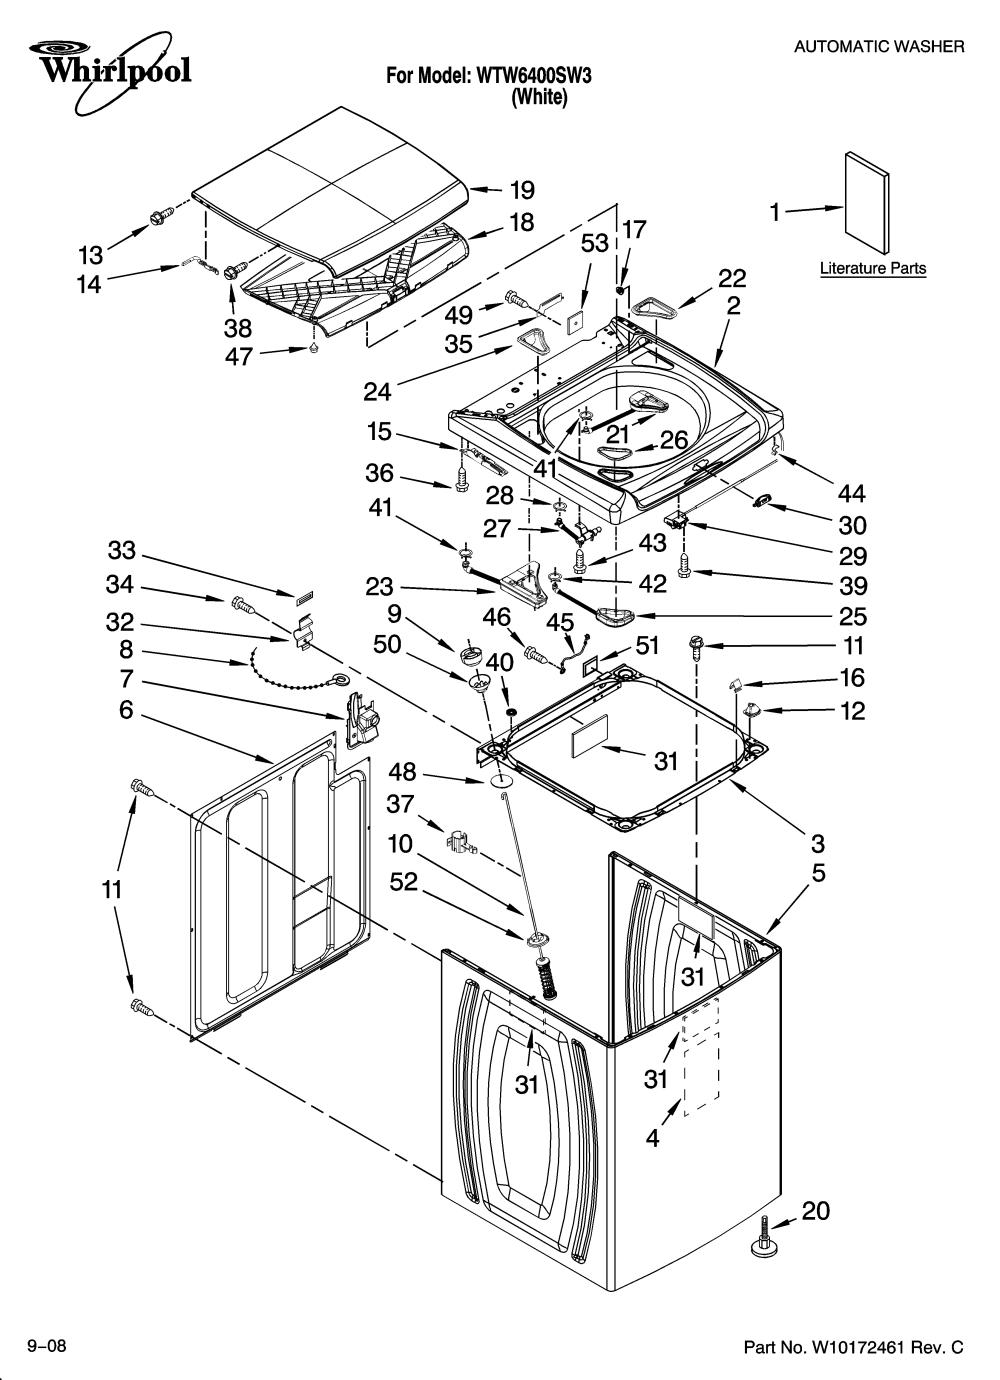 medium resolution of whirlpool cabrio diagram simple wiring schema whirlpool washing machine schematic diagram whirlpool cabrio washer wiring diagram